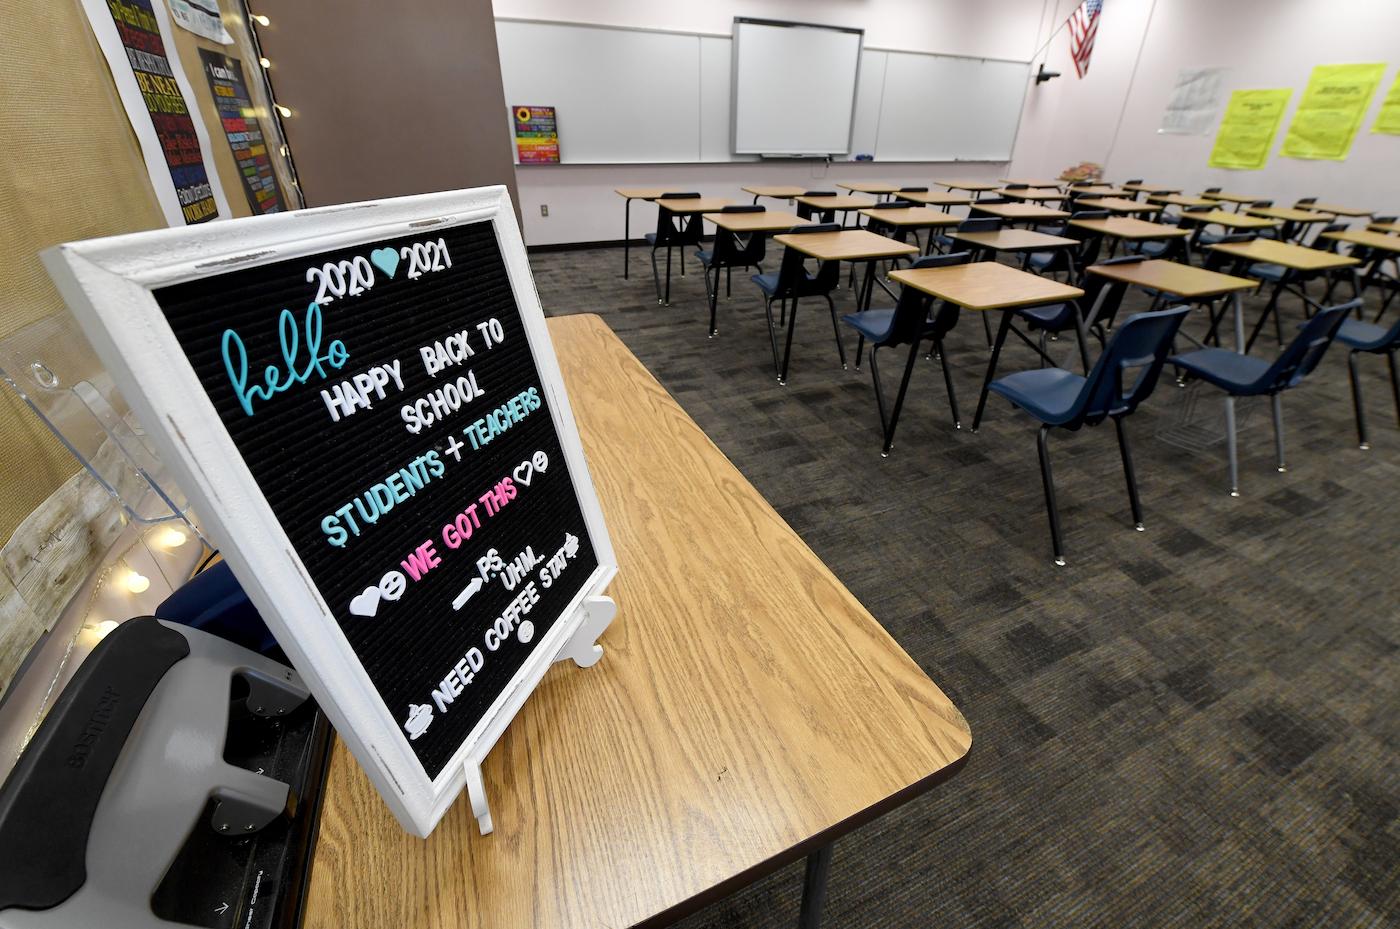 Cyberattacks against K-12 schools rose 18% in 2020, report finds | EdScoop